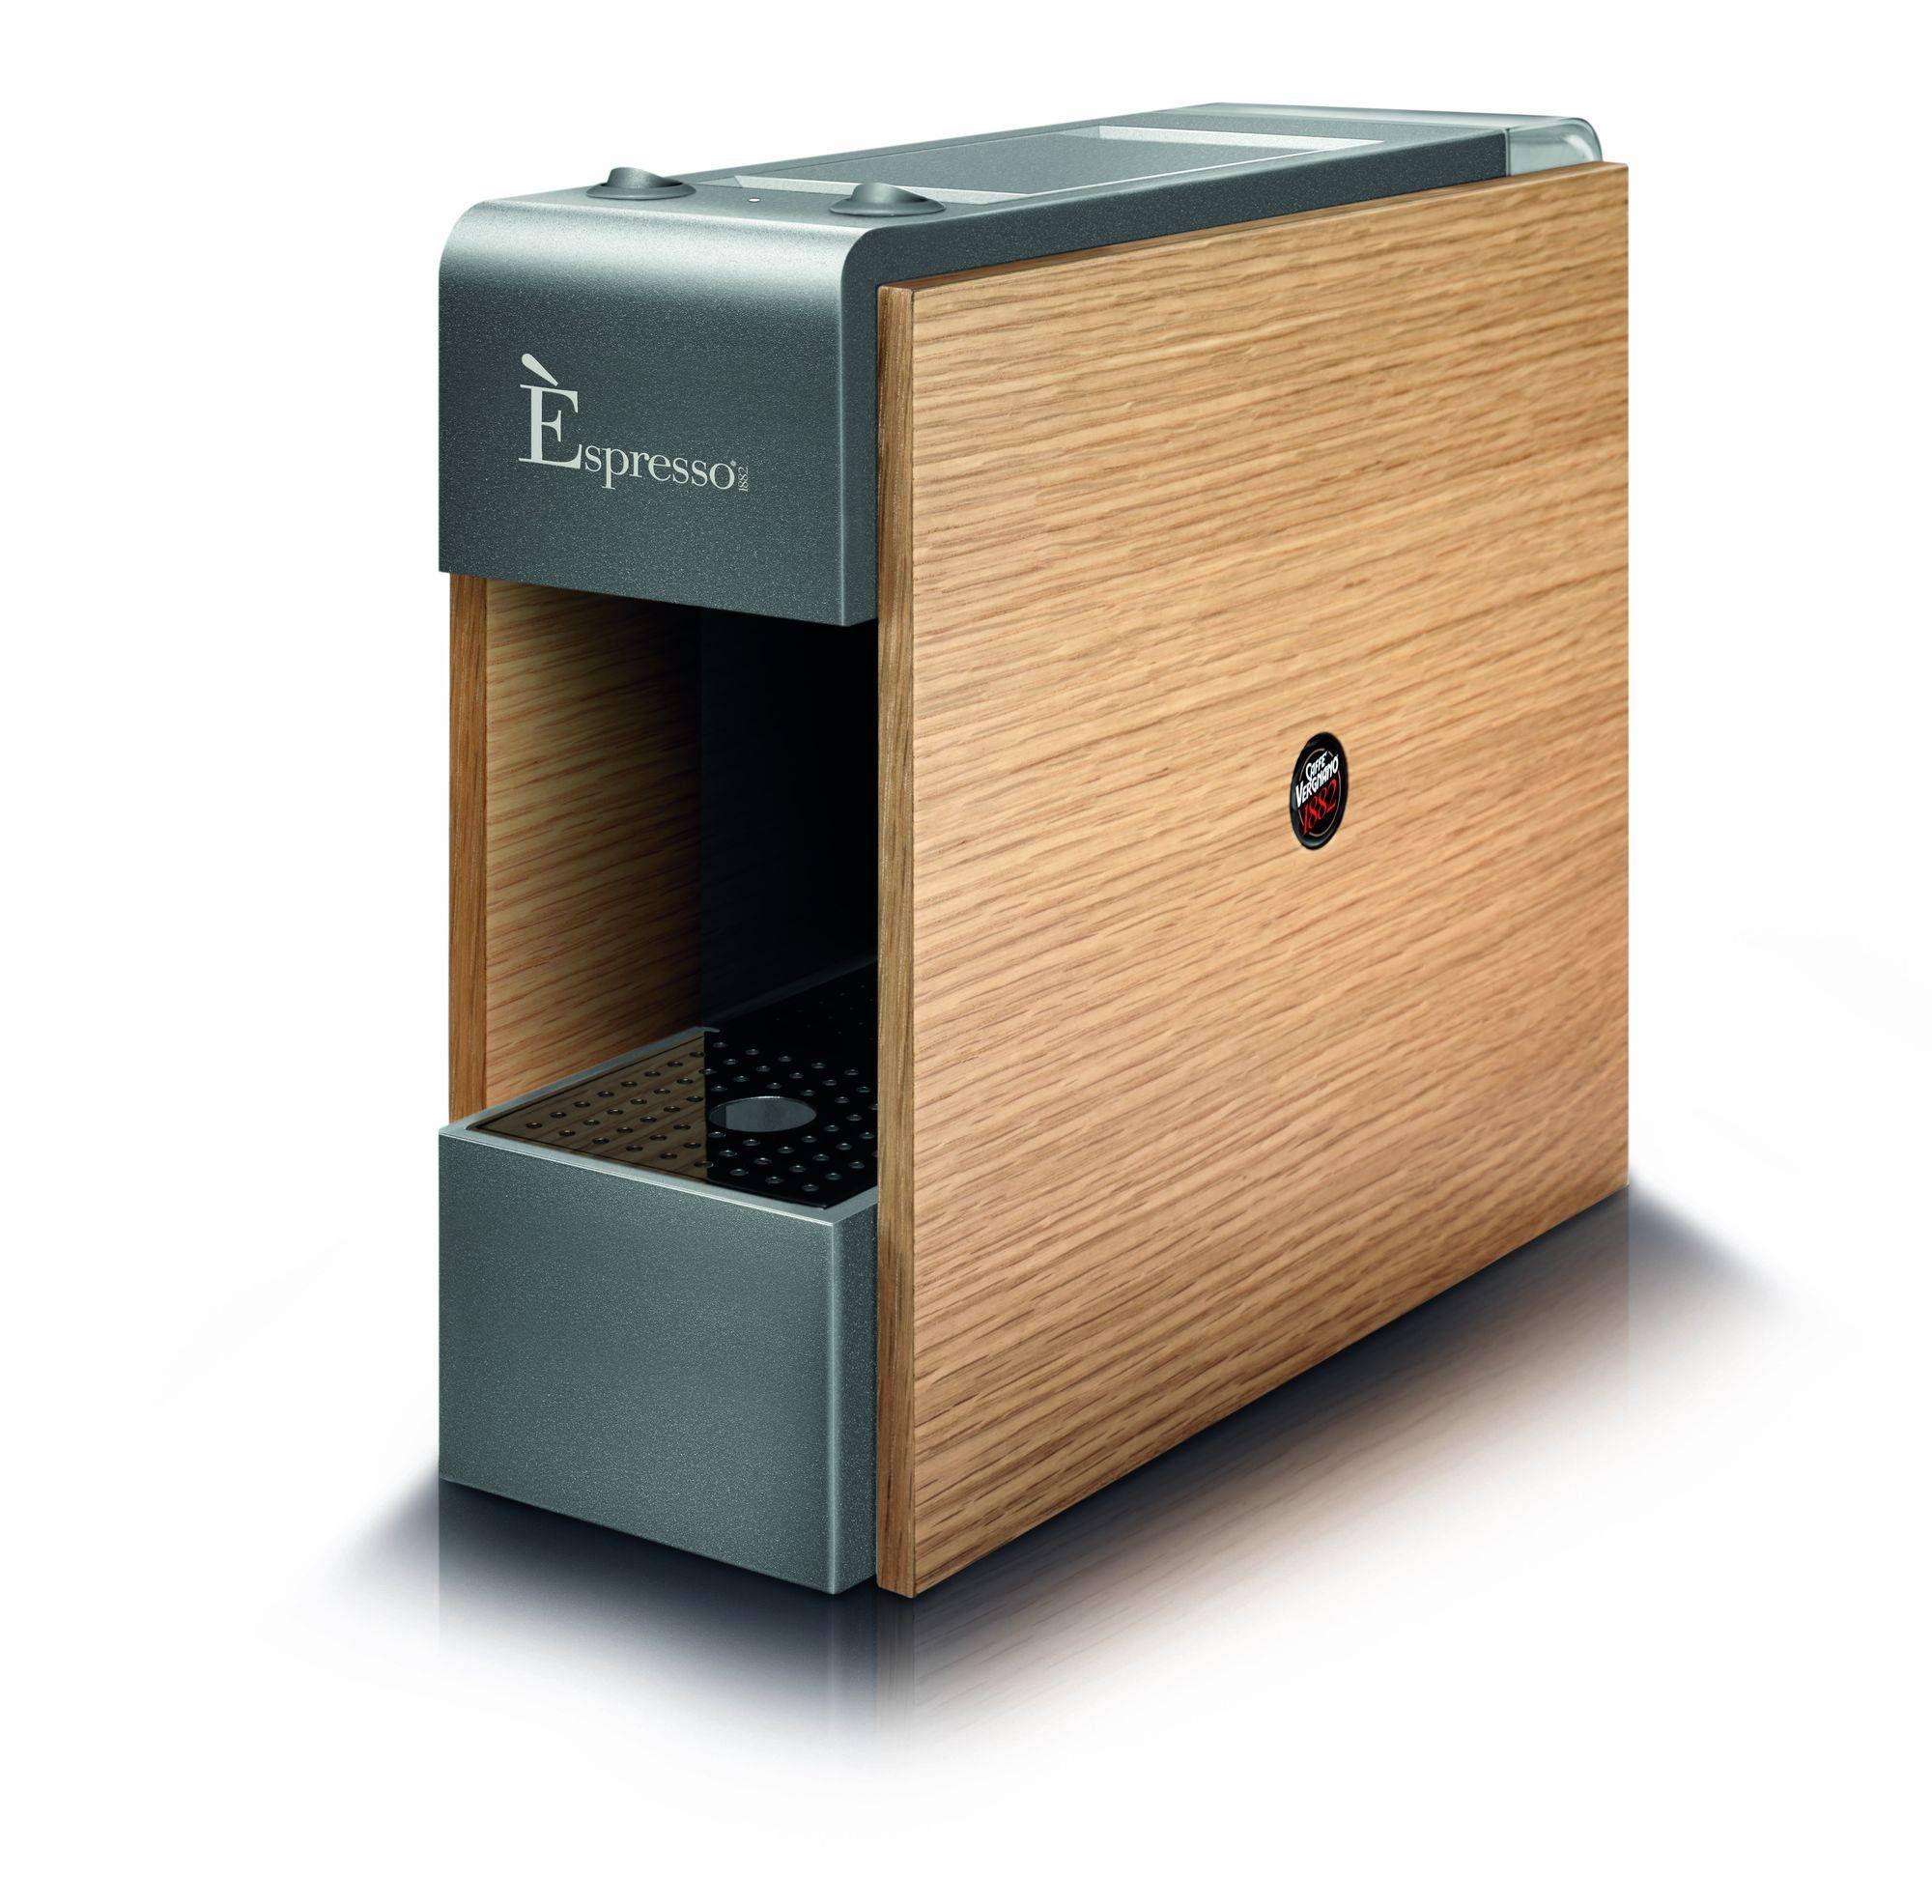 machine e espresso tre vergnano bois et grise compatible. Black Bedroom Furniture Sets. Home Design Ideas